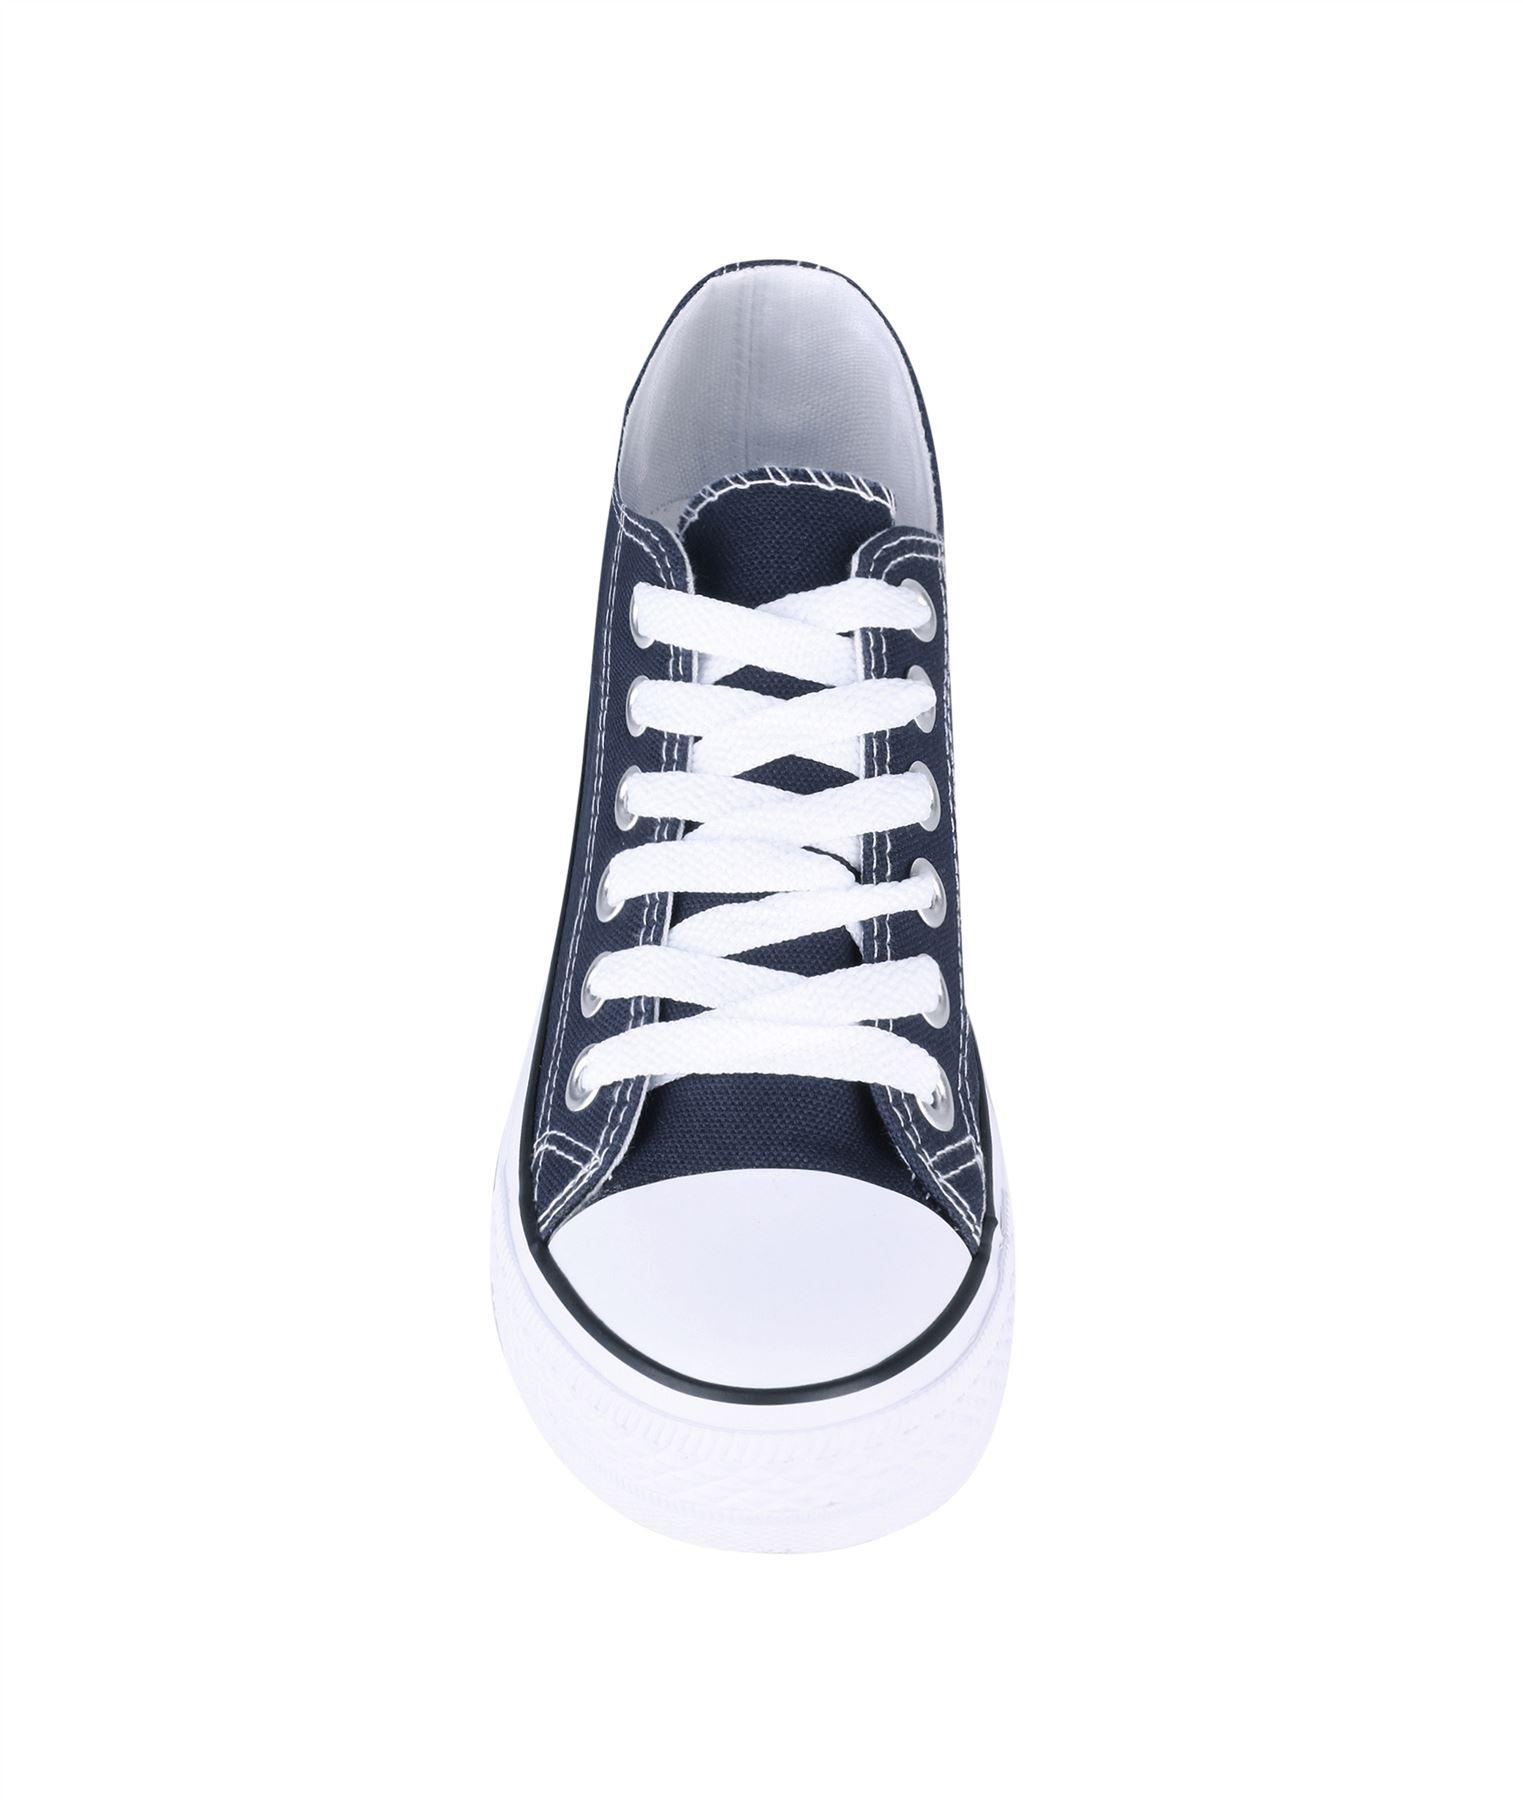 Zapatillas-Mujer-Casuales-Deportiva-Barata-Lona-Moda-Originales-Outlet-Tela-Moda miniatura 4